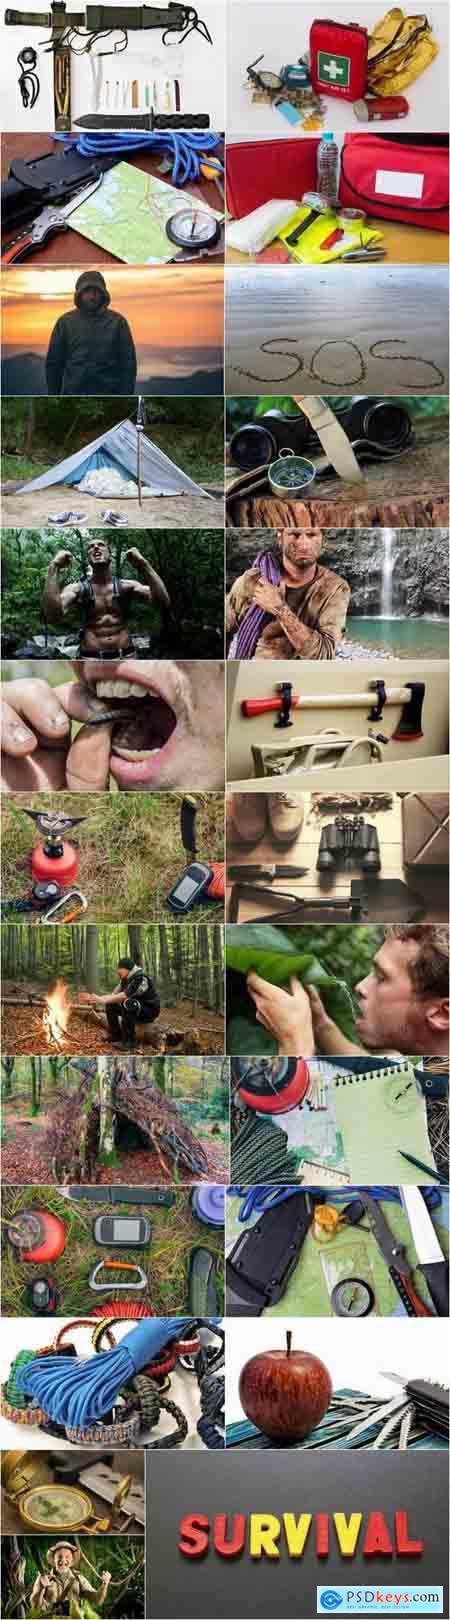 Travel survival kit scout tourism traveler 25 HQ Jpeg